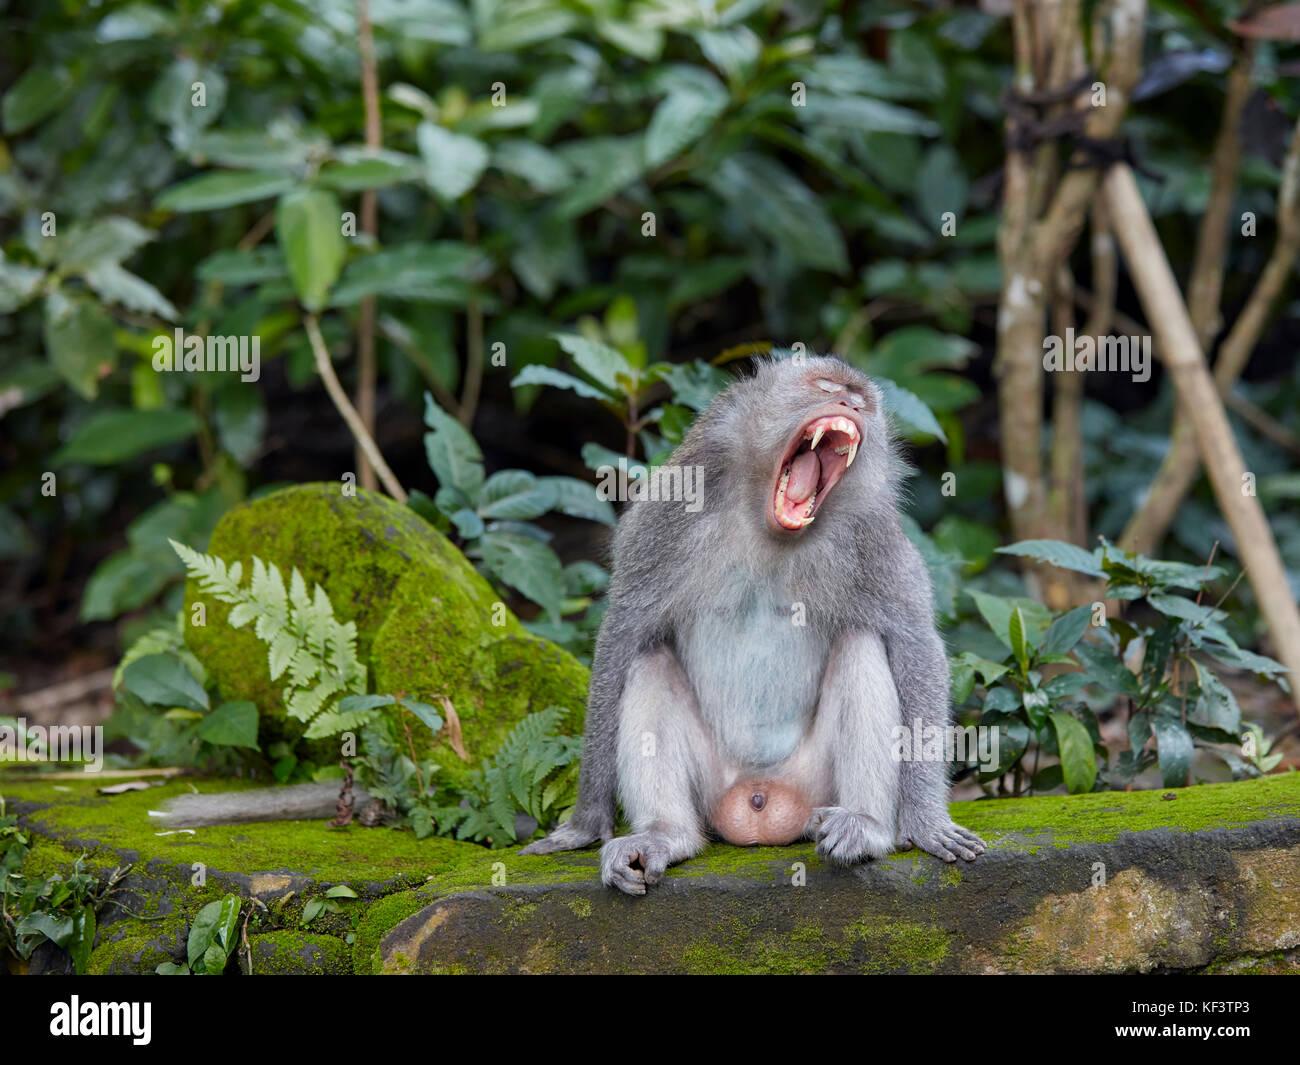 Male adult long-tailed macaque (Macaca fascicularis) yawning. Sacred Monkey Forest Sanctuary, Ubud, Bali, Indonesia. - Stock Image